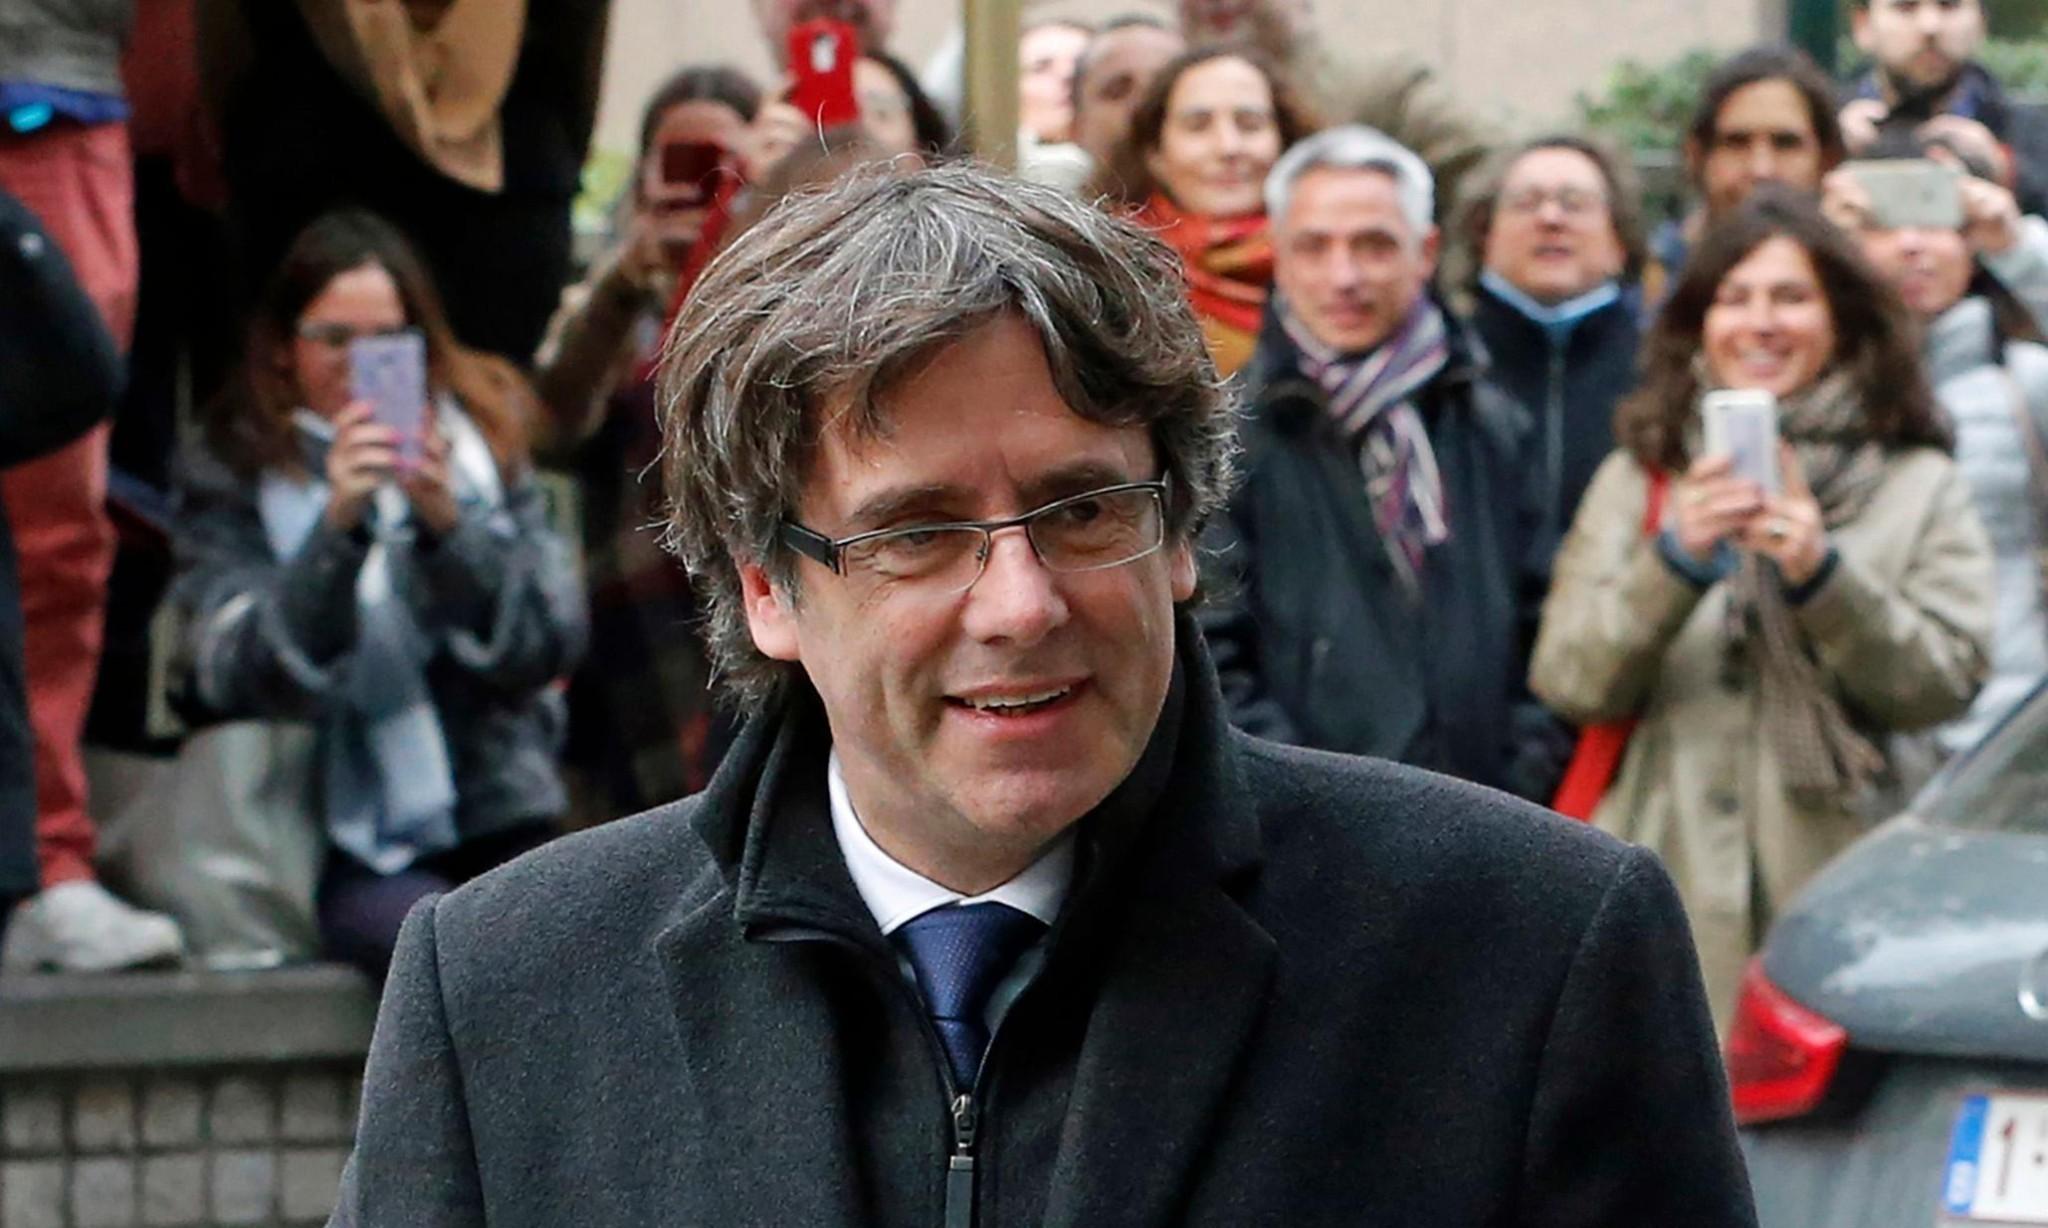 Carles Puigdemont 'turns himself in' to Belgian police